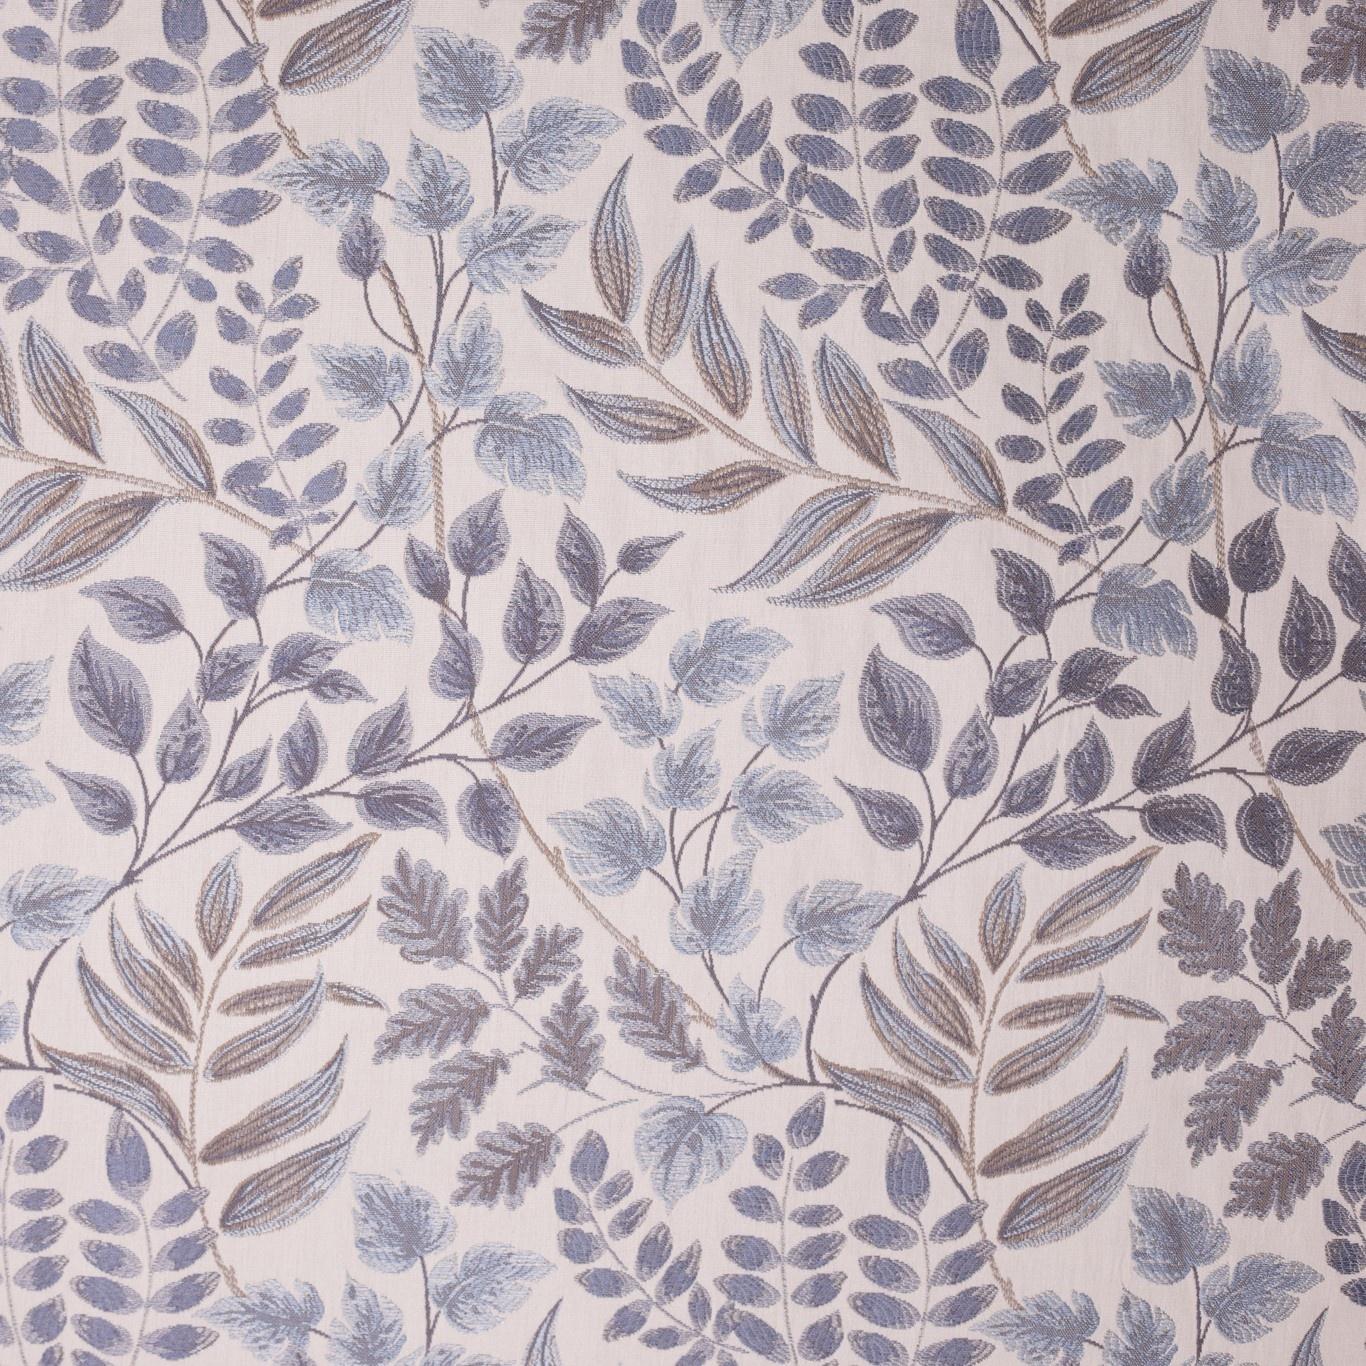 Image of Voyage Listaro Bluebell Curtain Fabric